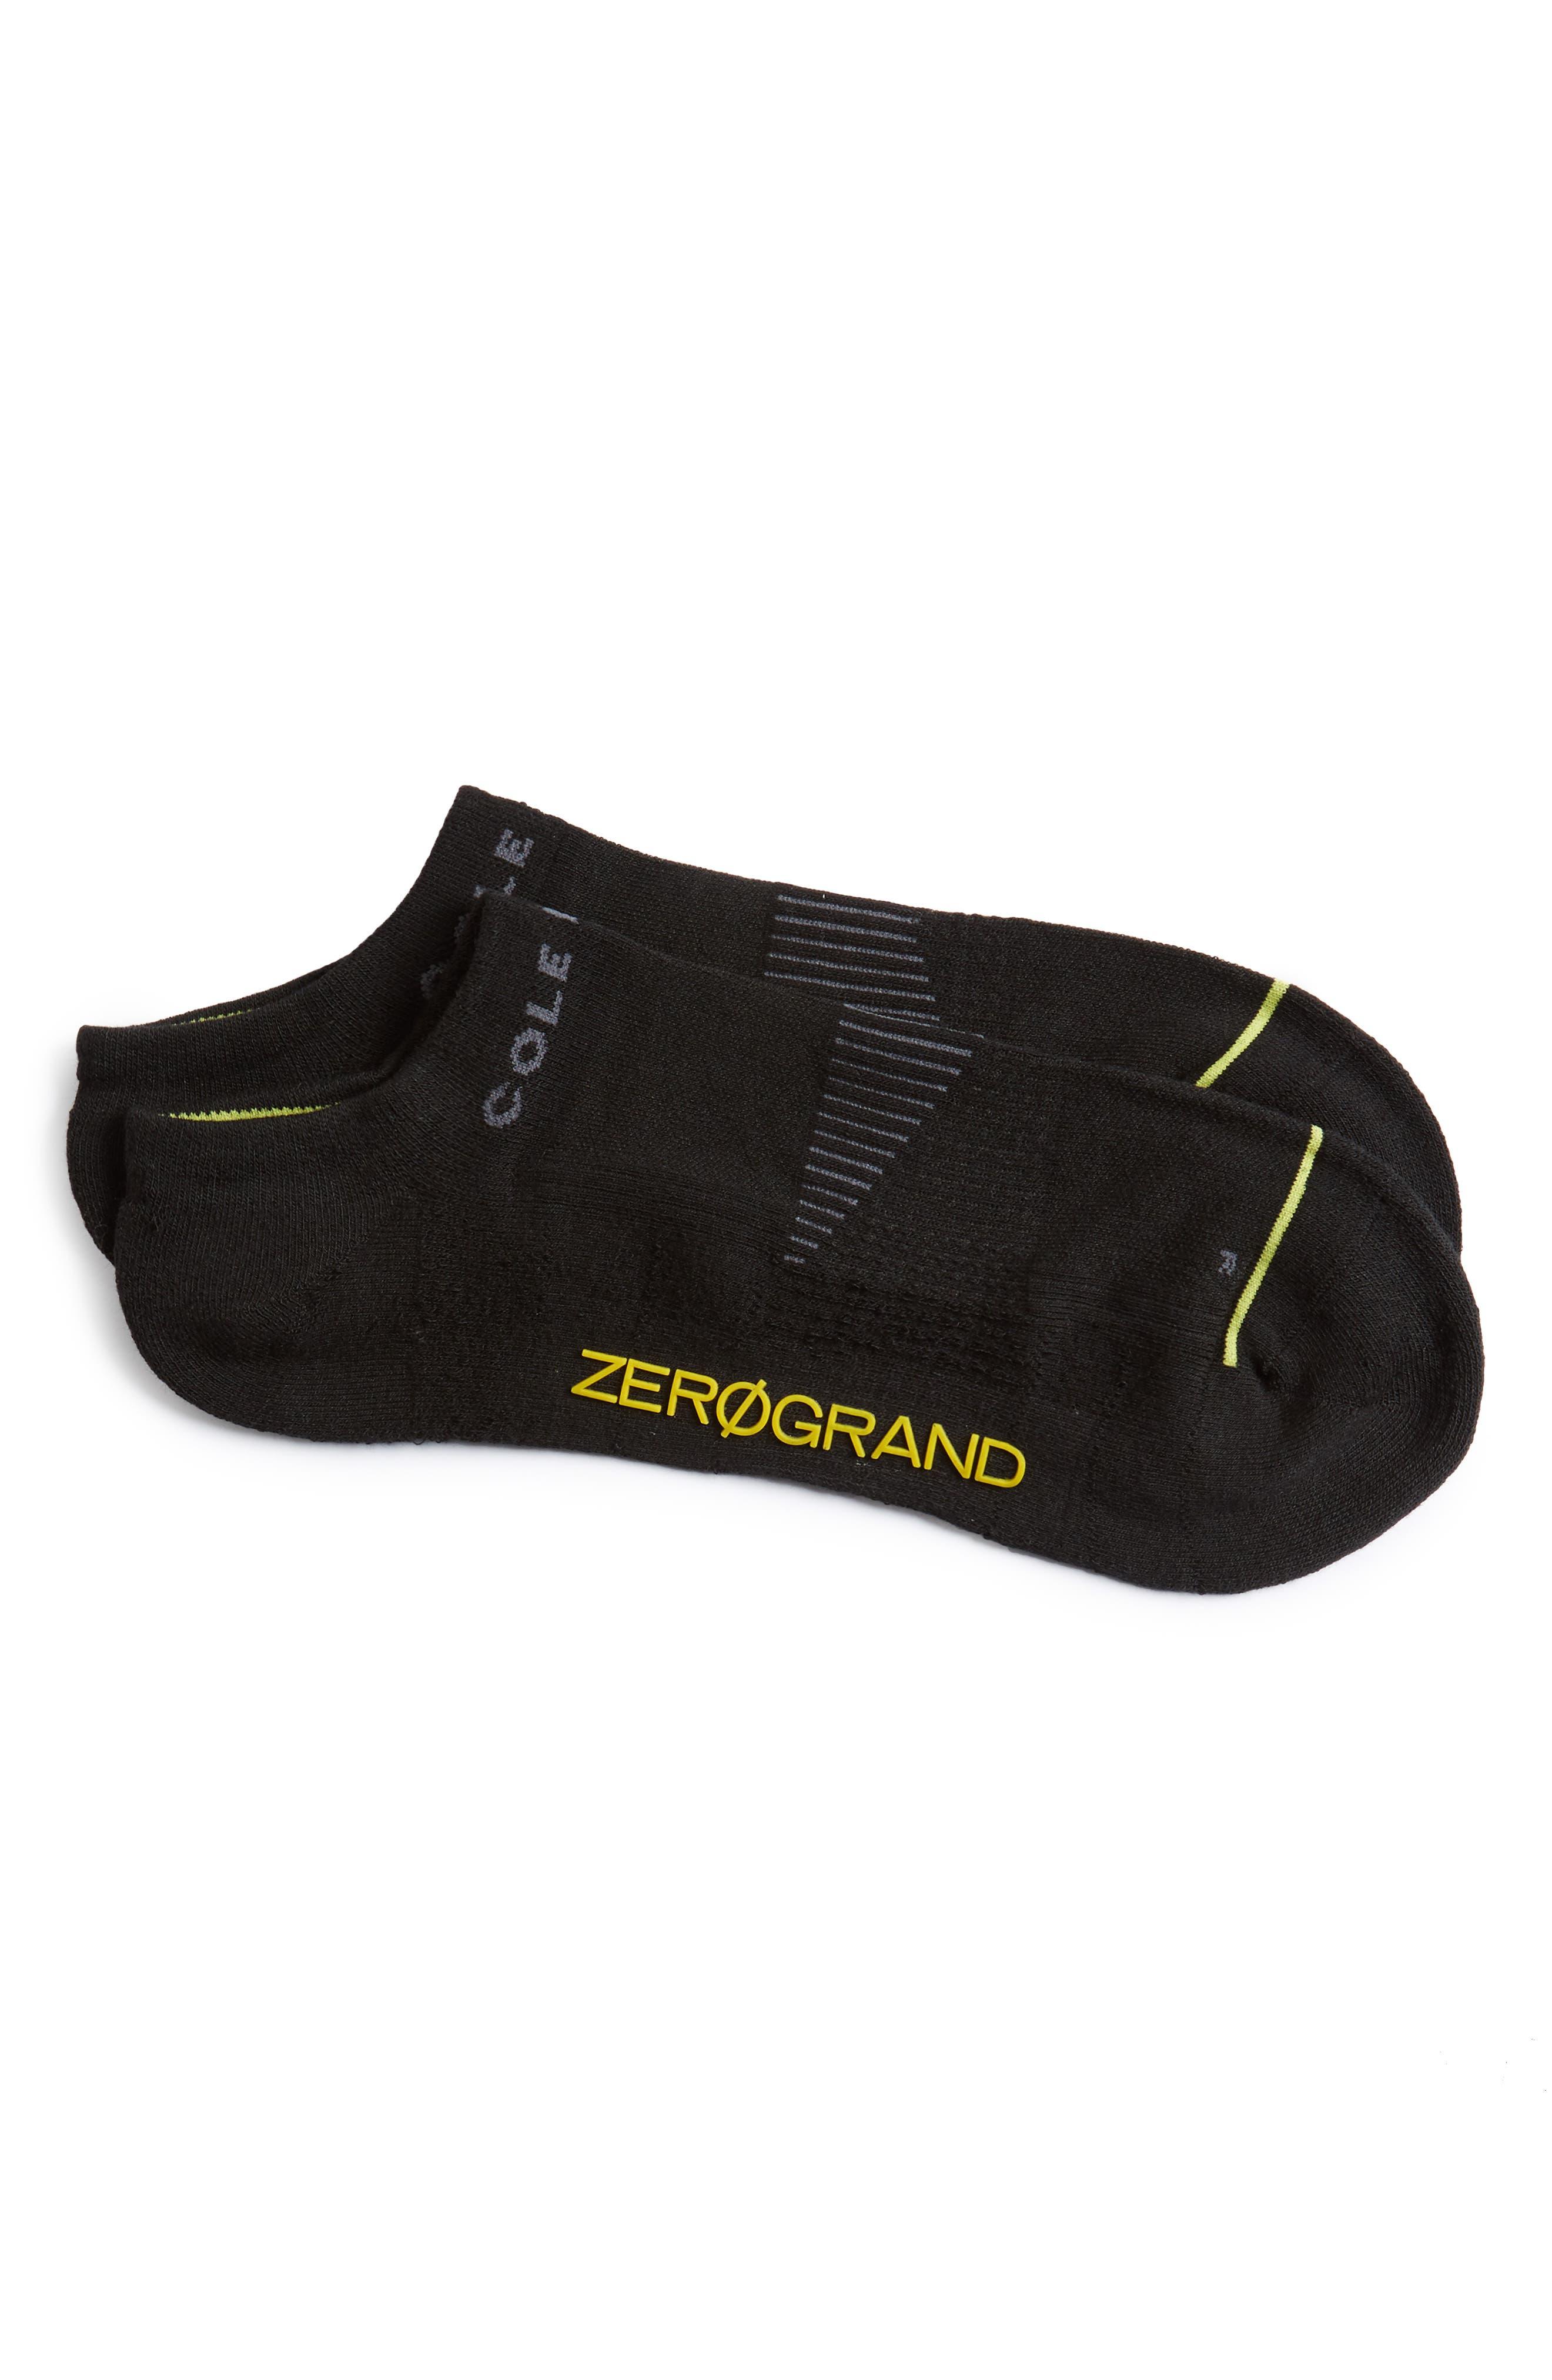 COLE HAAN,                             ZeroGrand Liner Socks,                             Main thumbnail 1, color,                             001